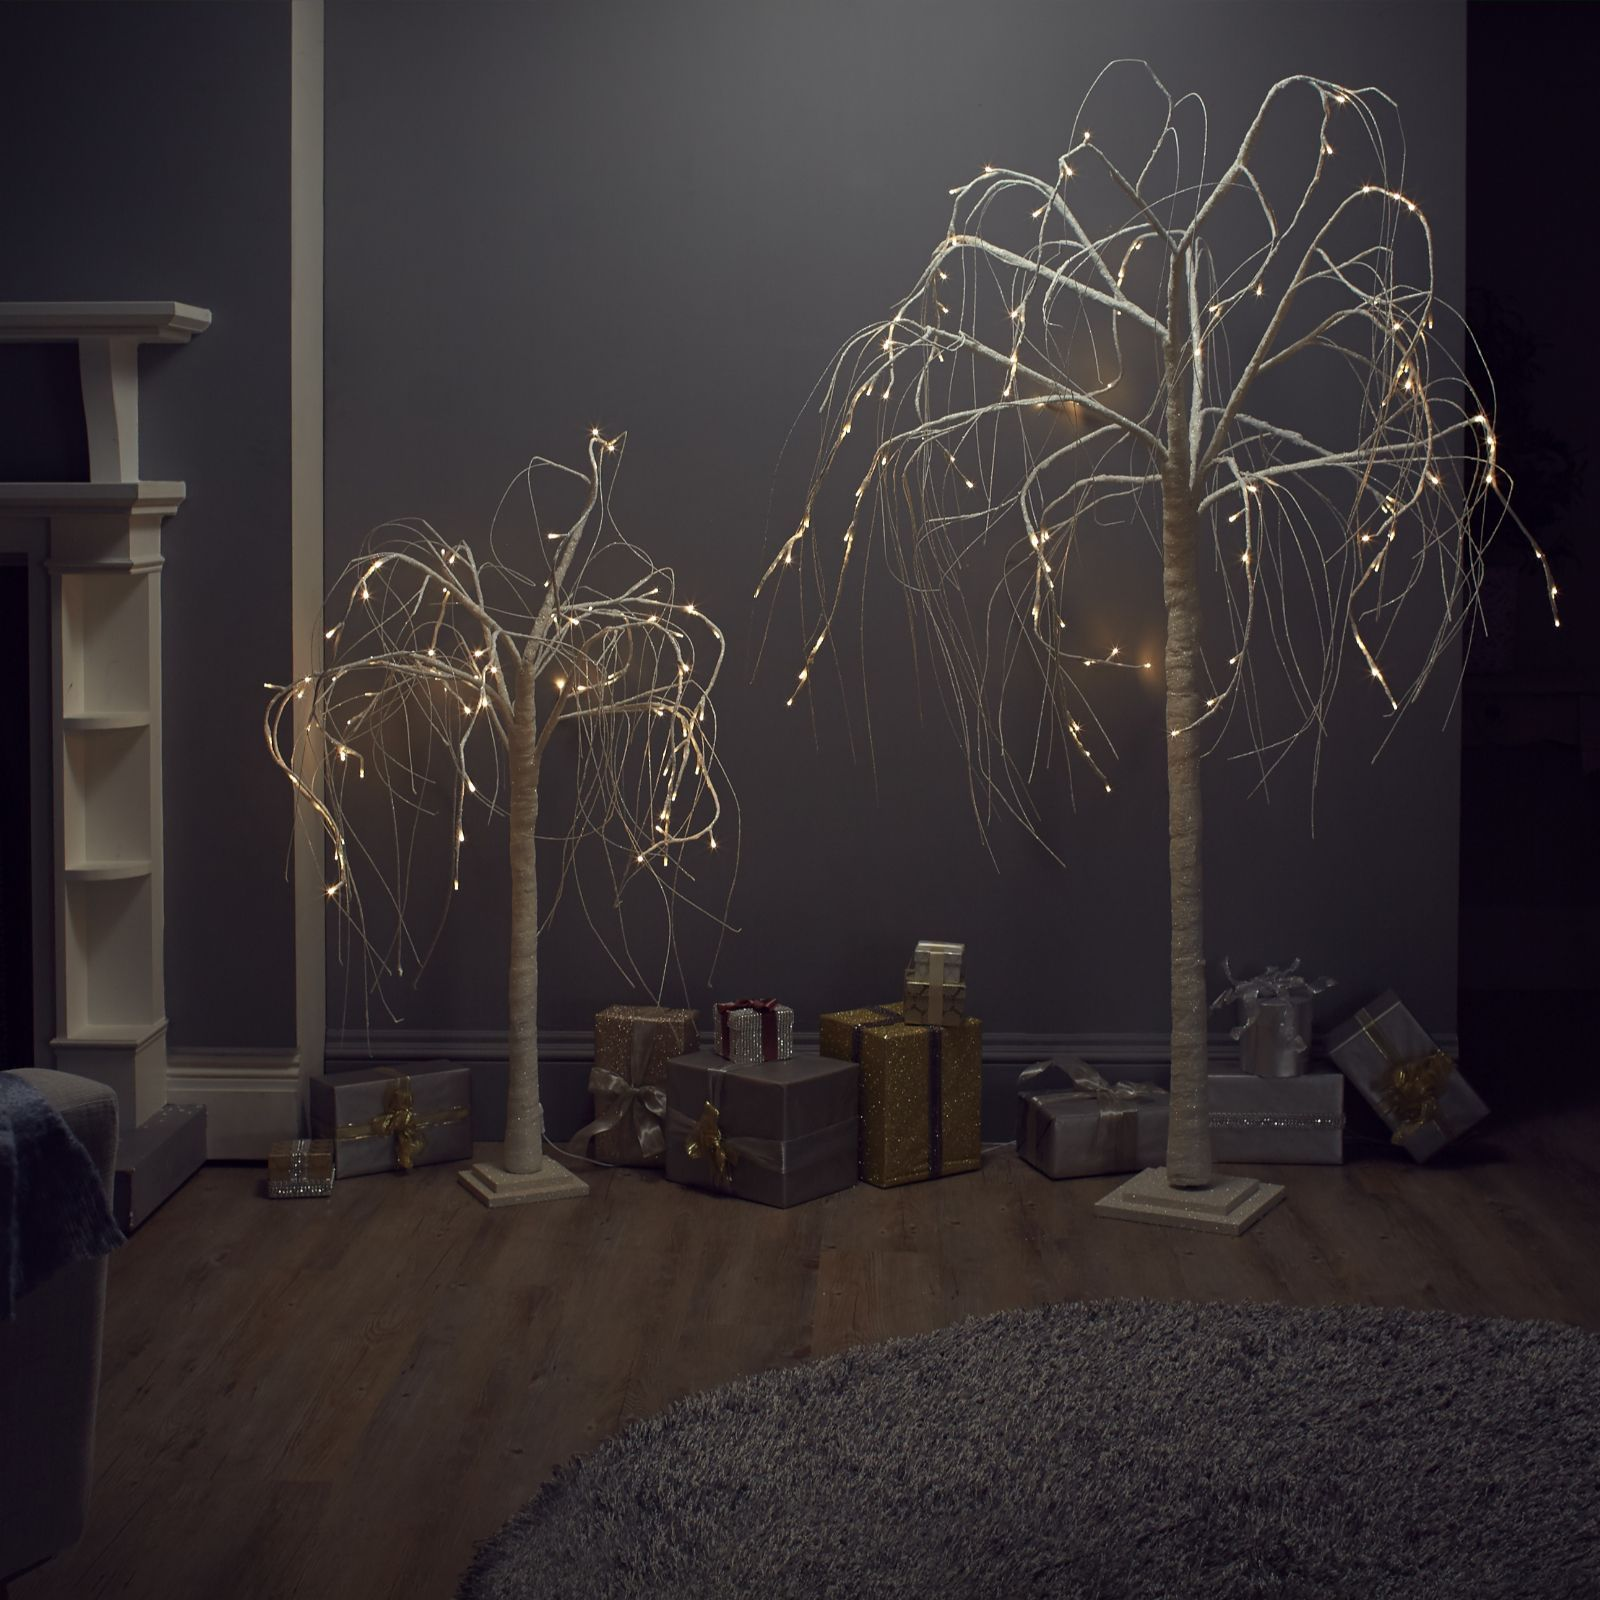 706190 Alison Cork Pre Lit Sparkling Willow Tree Qvc Price 4400